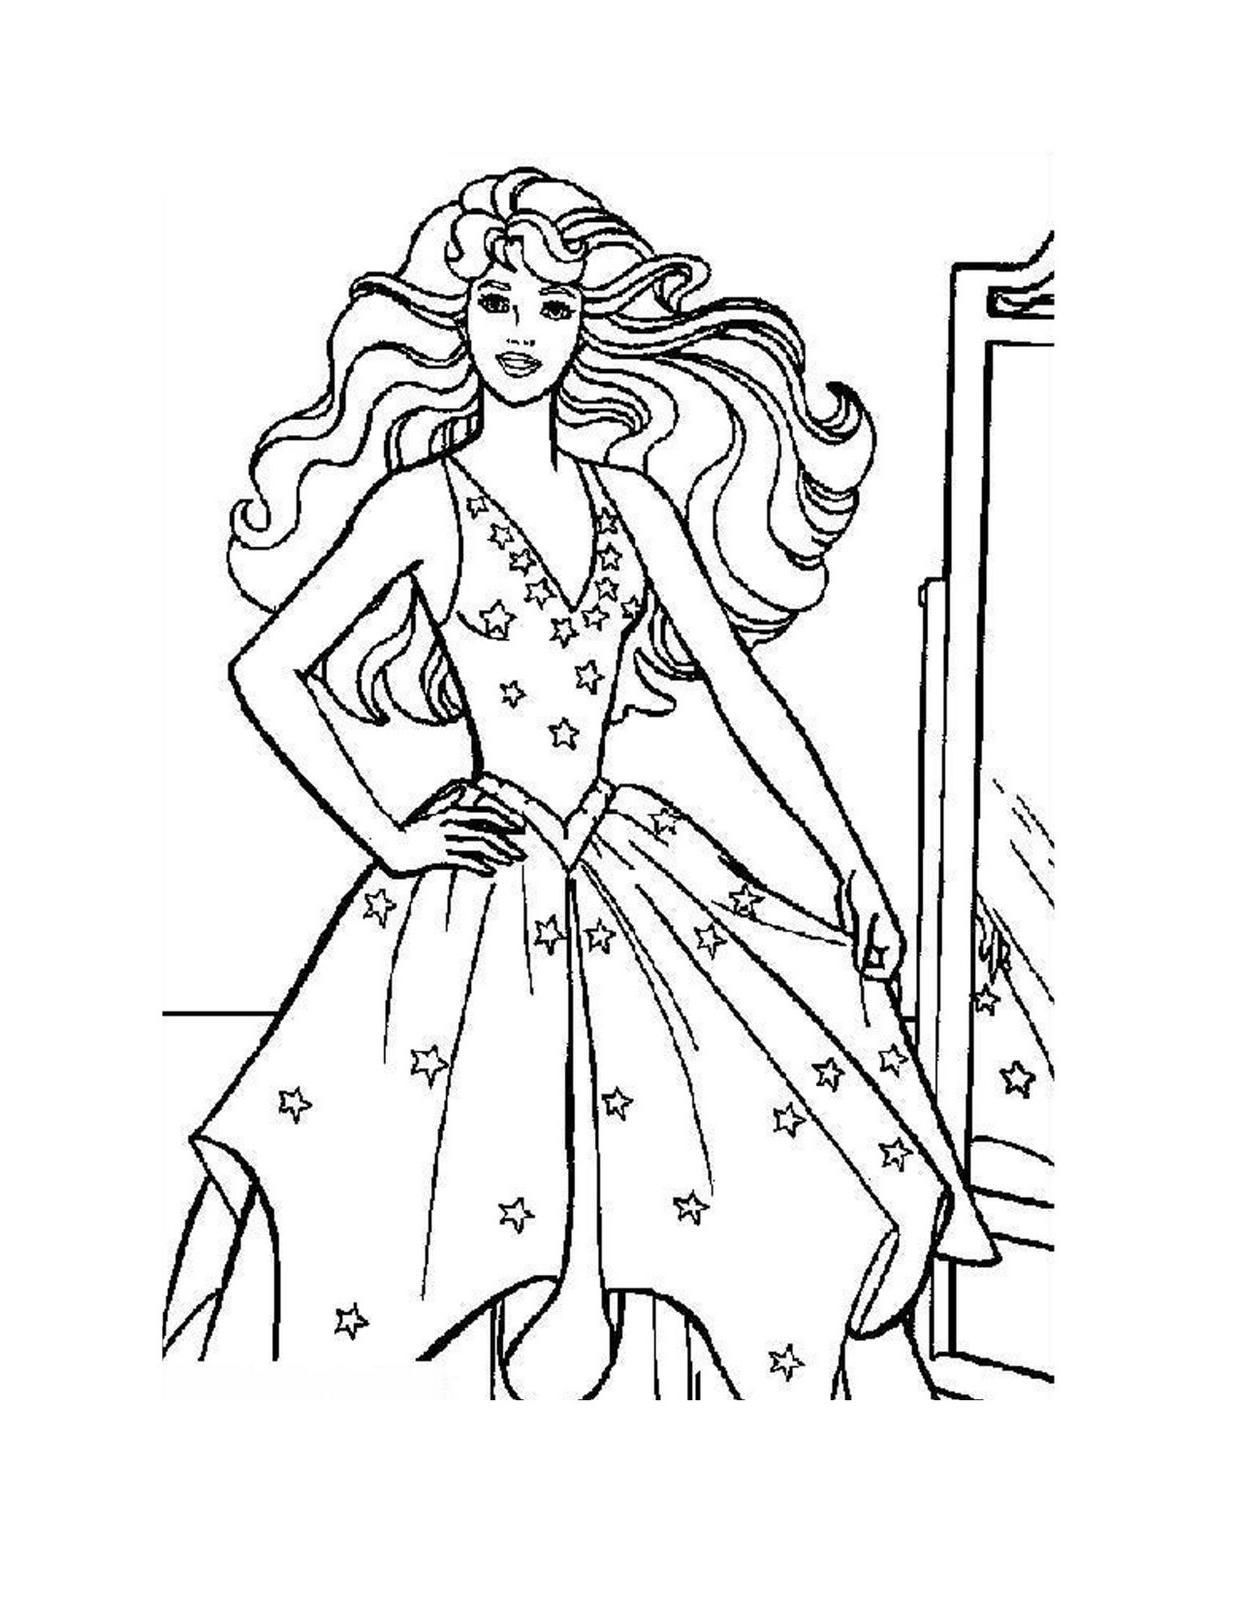 Free Printable Disney Princess Coloring Pages at GetDrawings.com ...